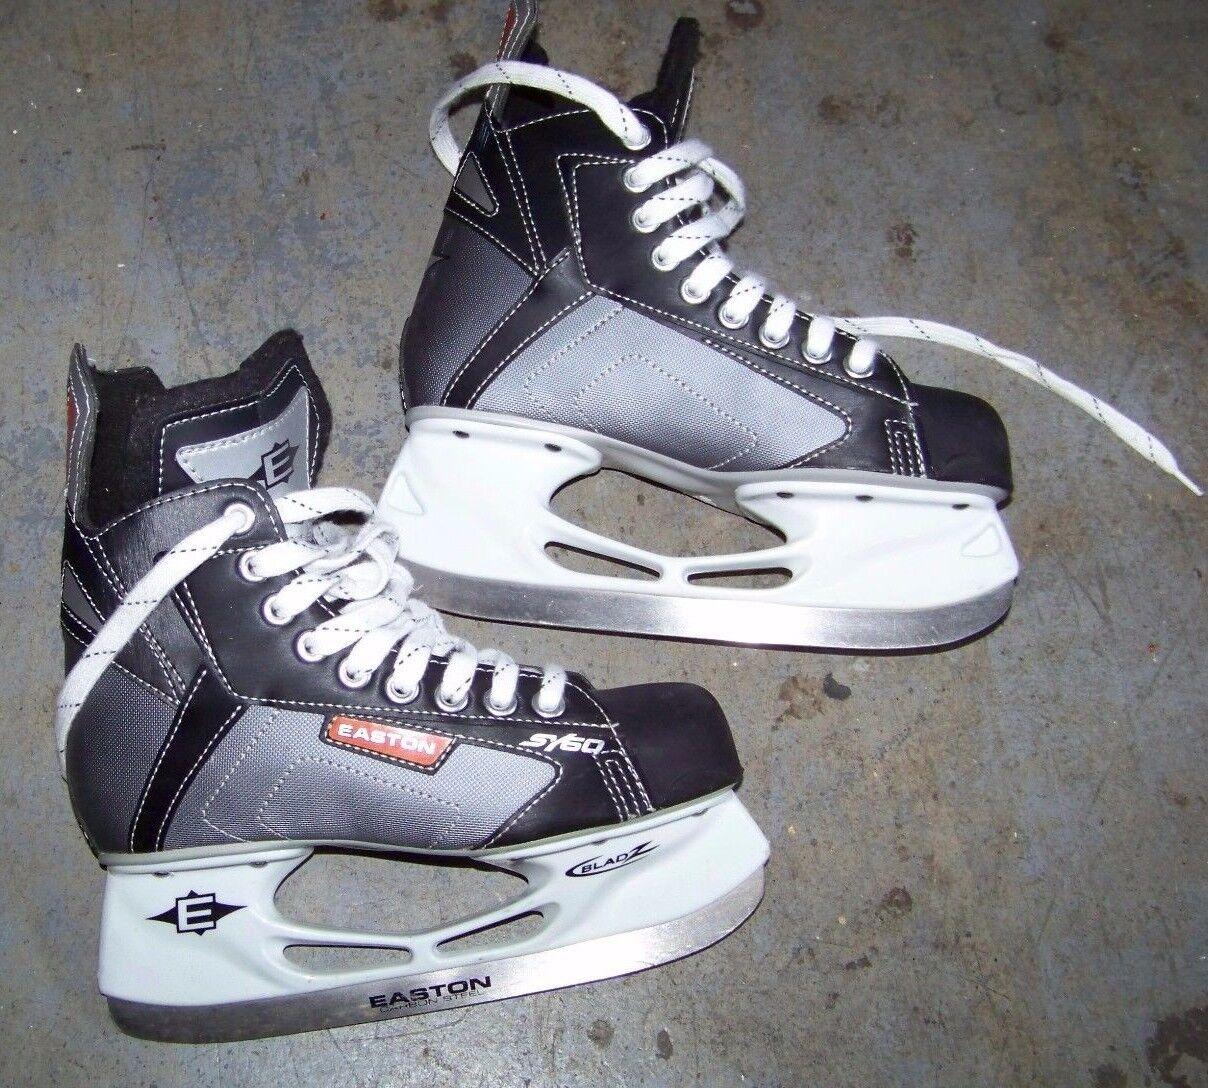 New Stainless Easton Runner Blade Razor Bladz II holder ice hockey stake